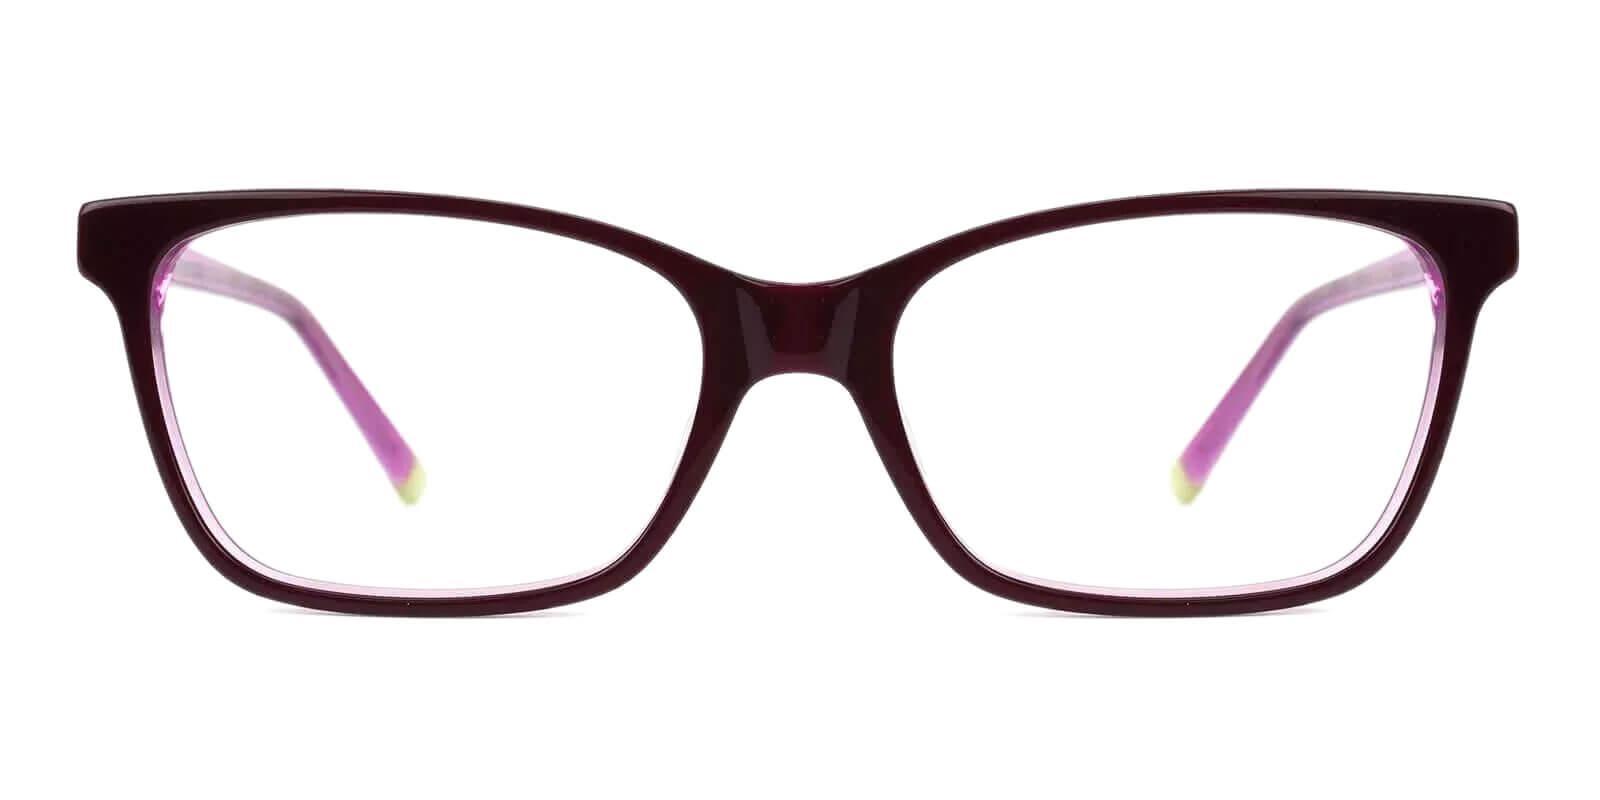 RingGold Purple Acetate Eyeglasses , SpringHinges , UniversalBridgeFit Frames from ABBE Glasses